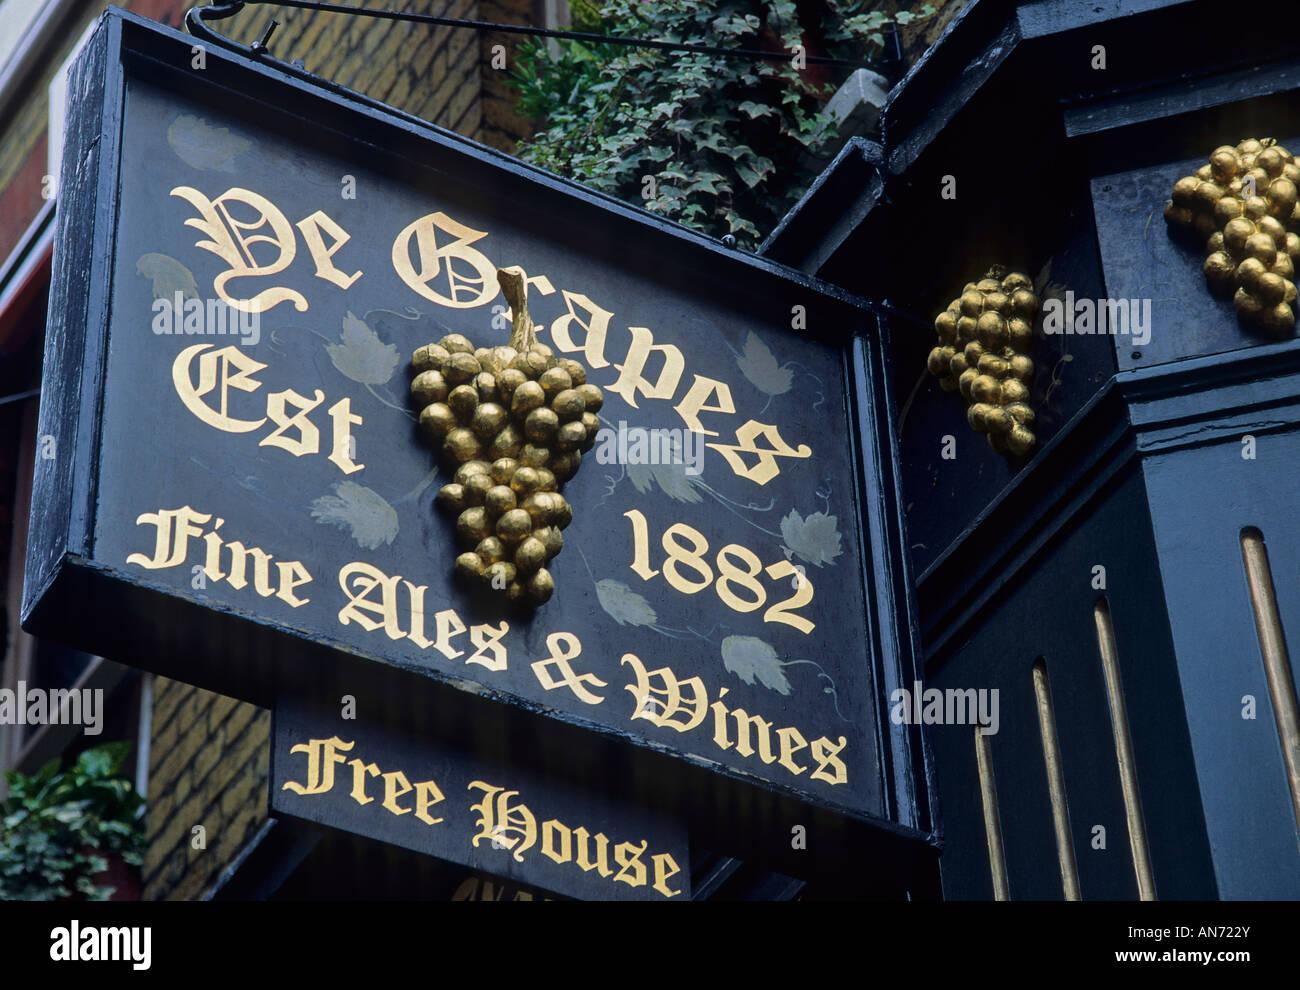 England London Mayfair Shepherd Market Ye Grapes pub bar sign - Stock Image